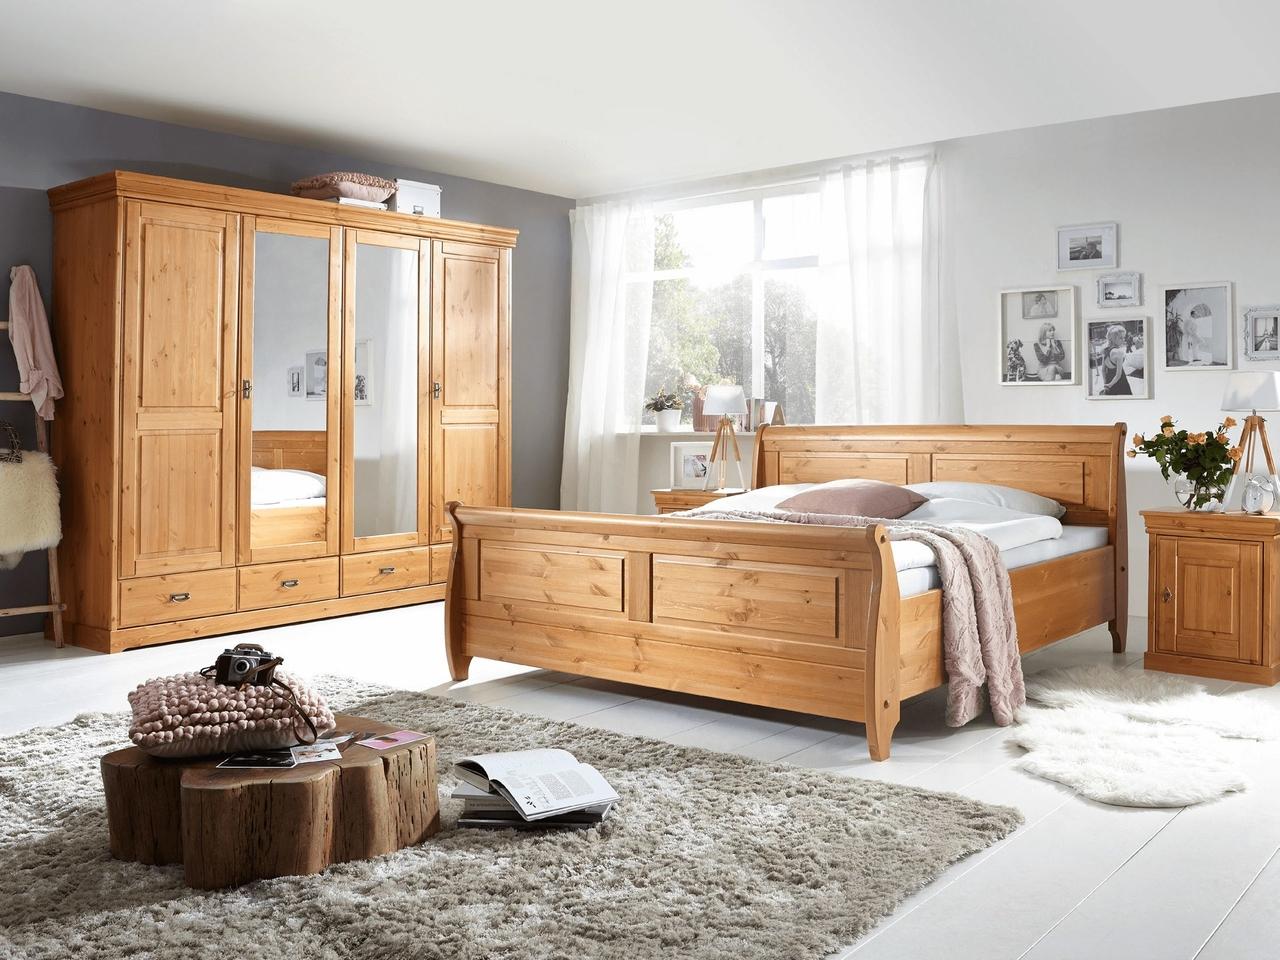 Schlafzimmer Mette Komplettset Landhausstil Kiefer massiv